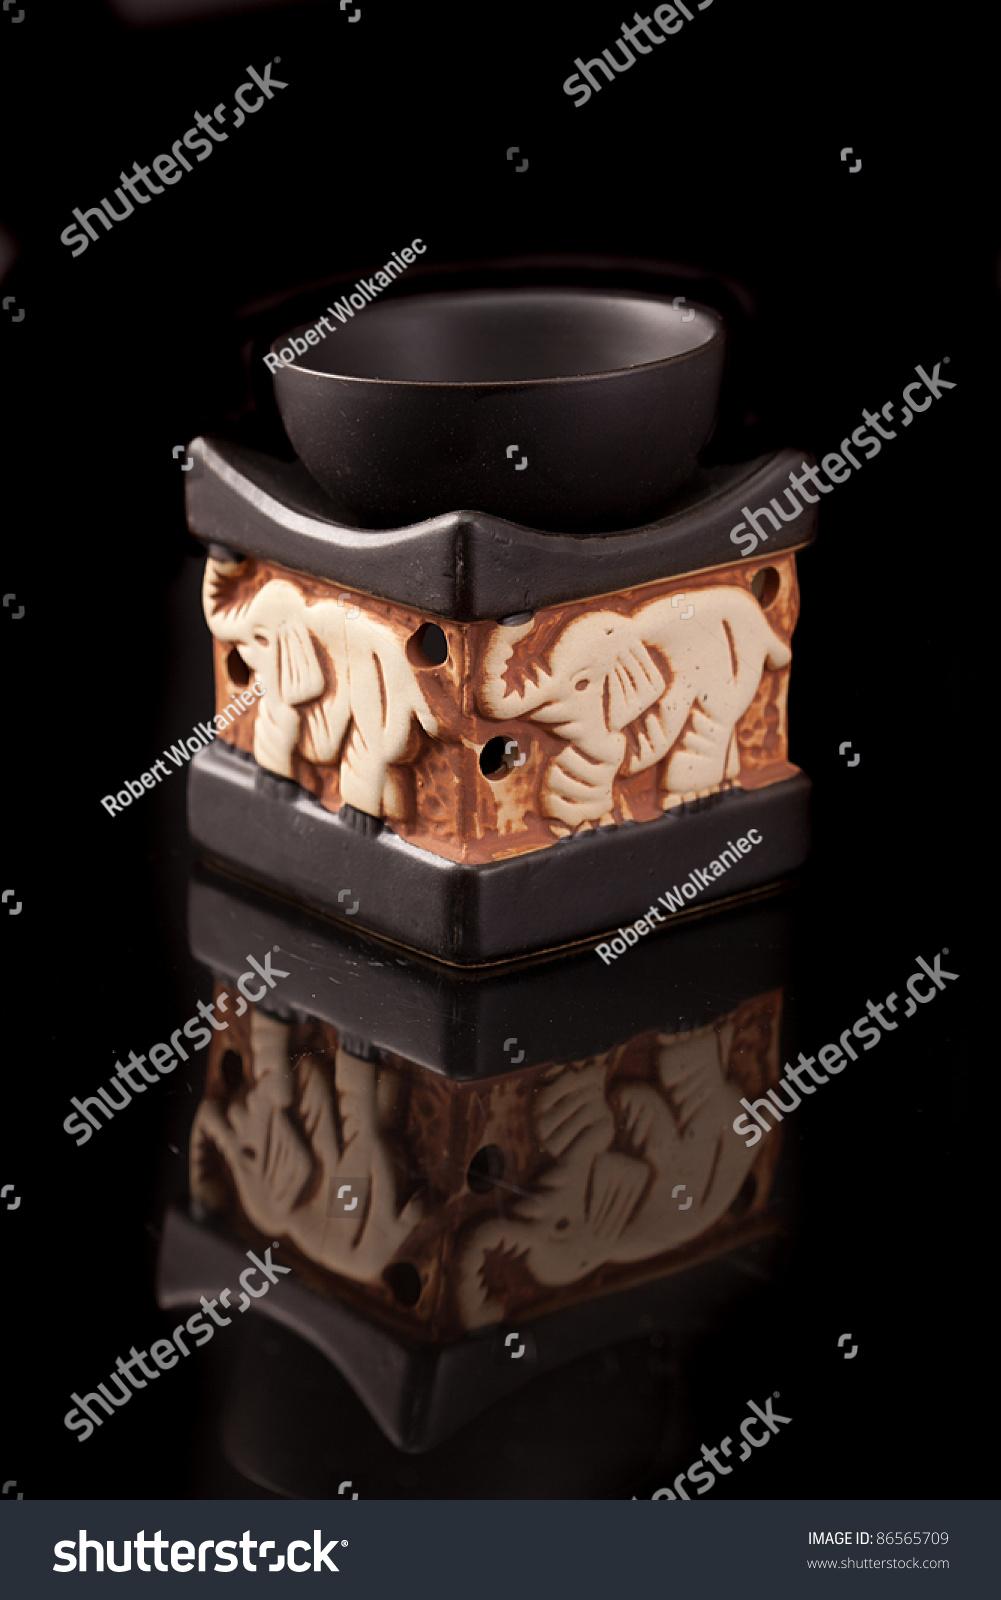 Fireplace Fragrance Fragrance Oil Lamp Stock Photo 86565709 ...